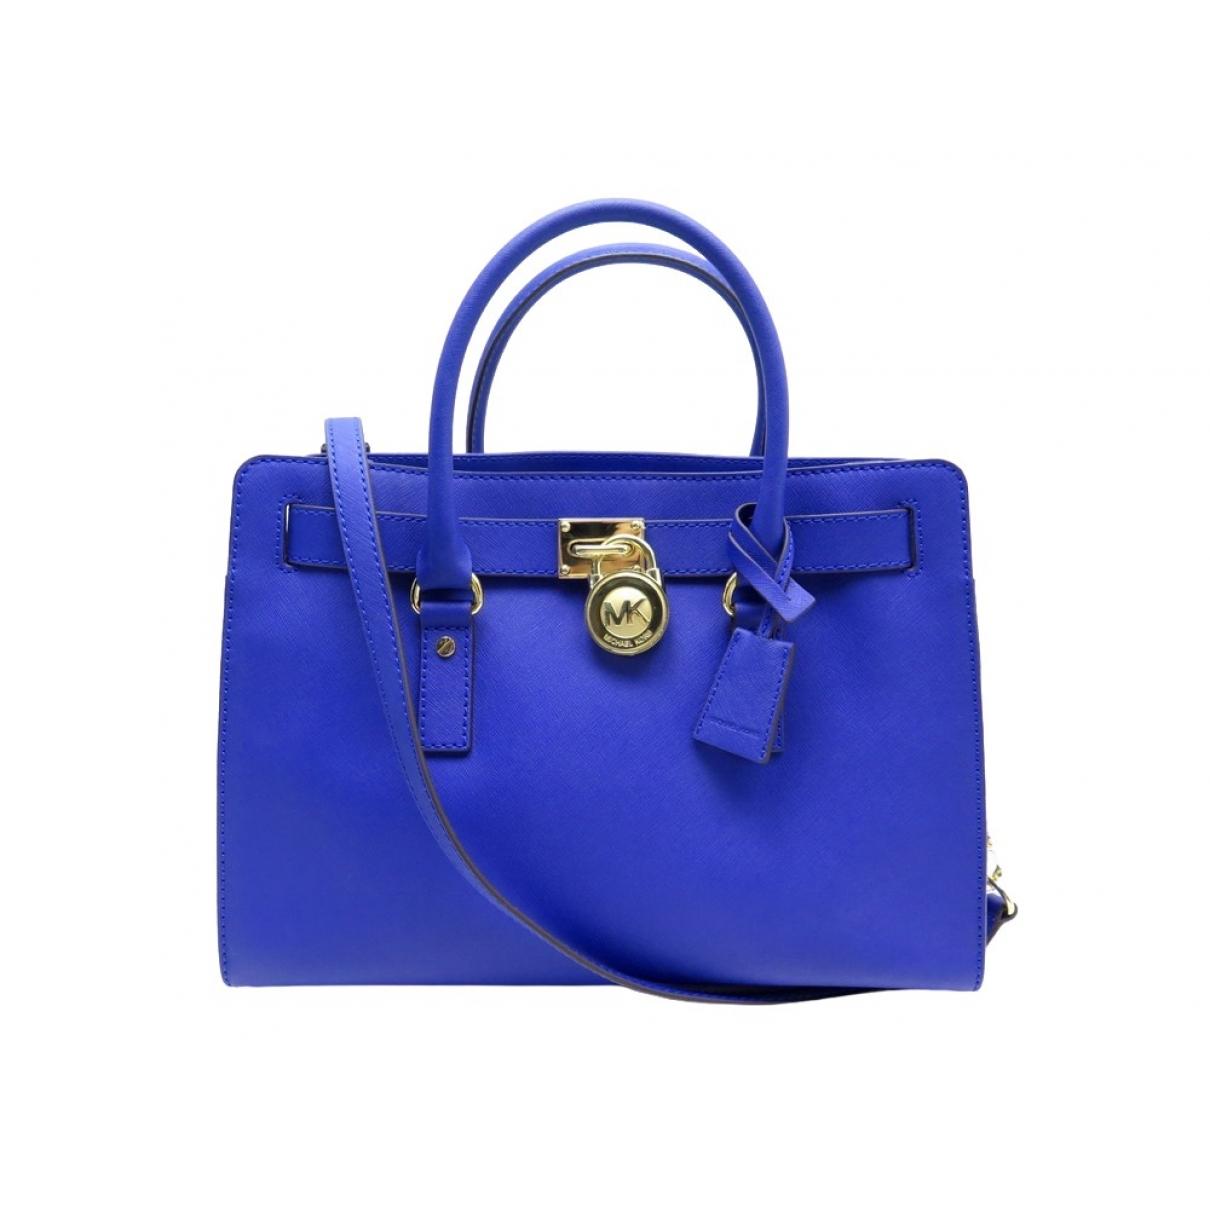 Michael Kors Hamilton Handtasche in  Blau Leder